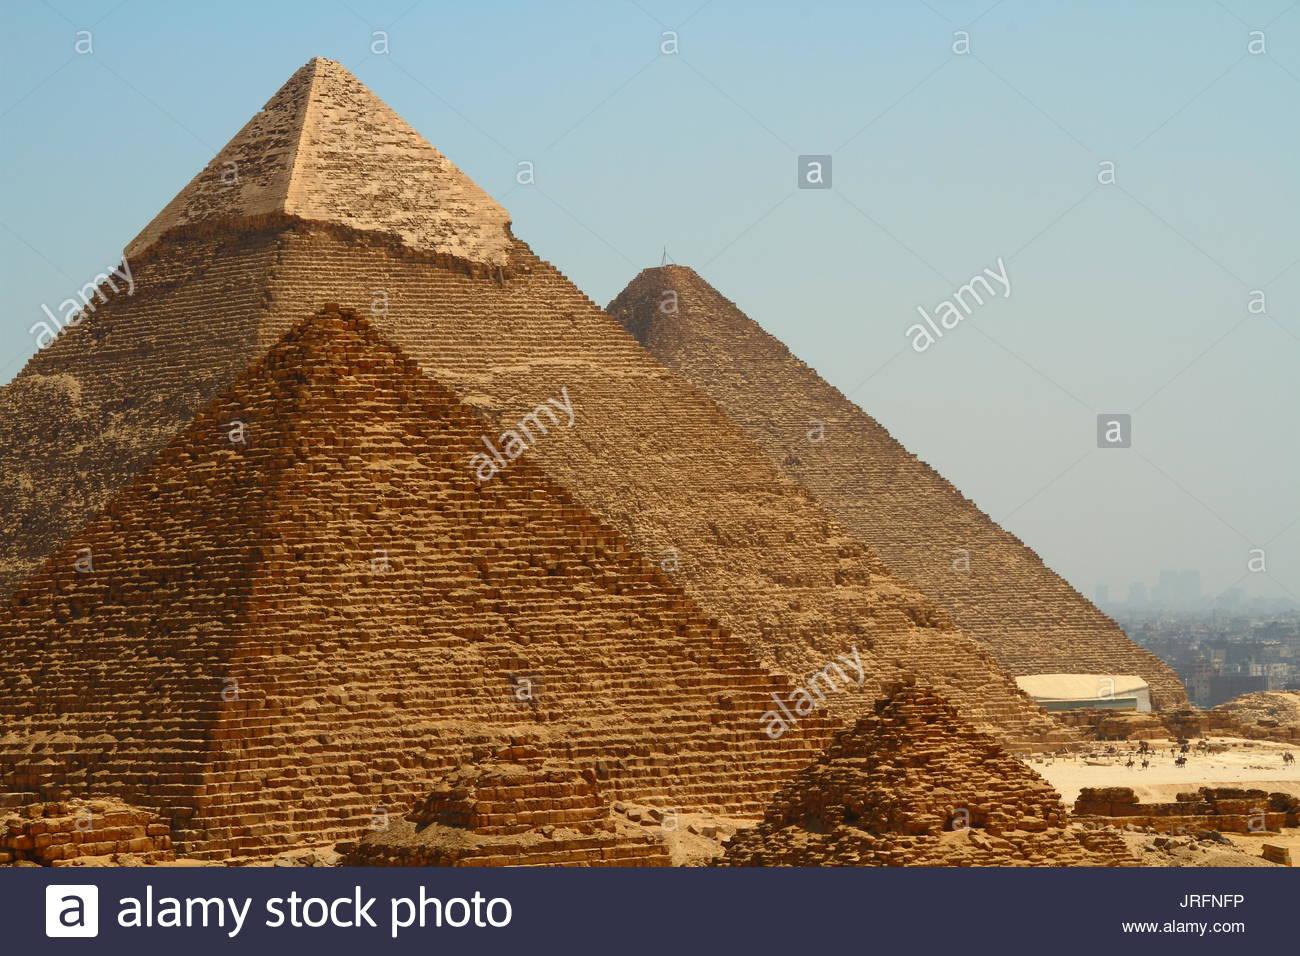 Egypt - Cairo - Pyramids site - Stock Image